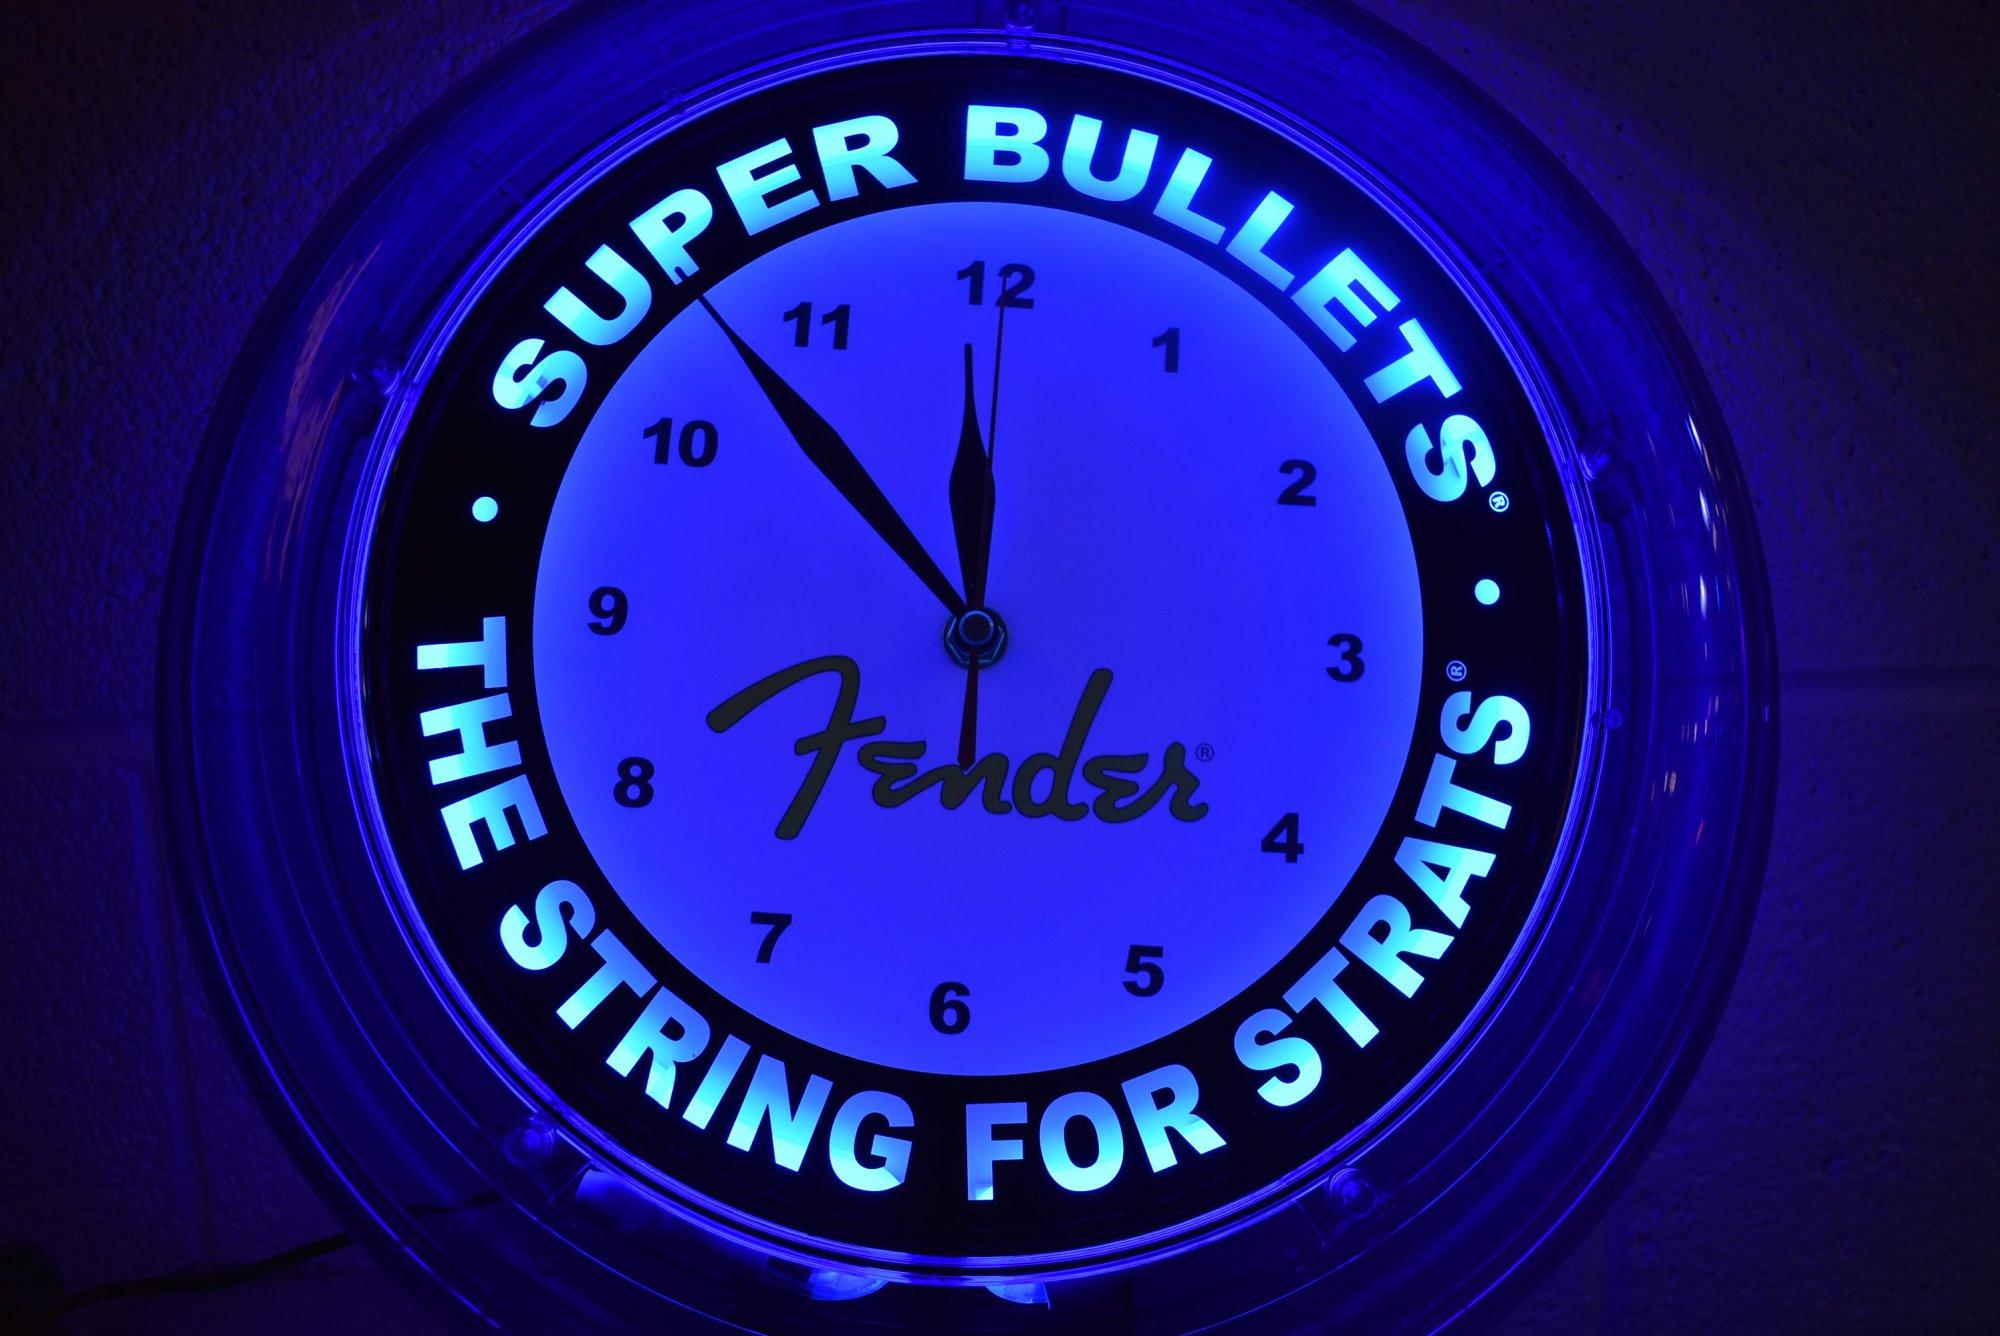 Fender Super Bullets Neon Clock